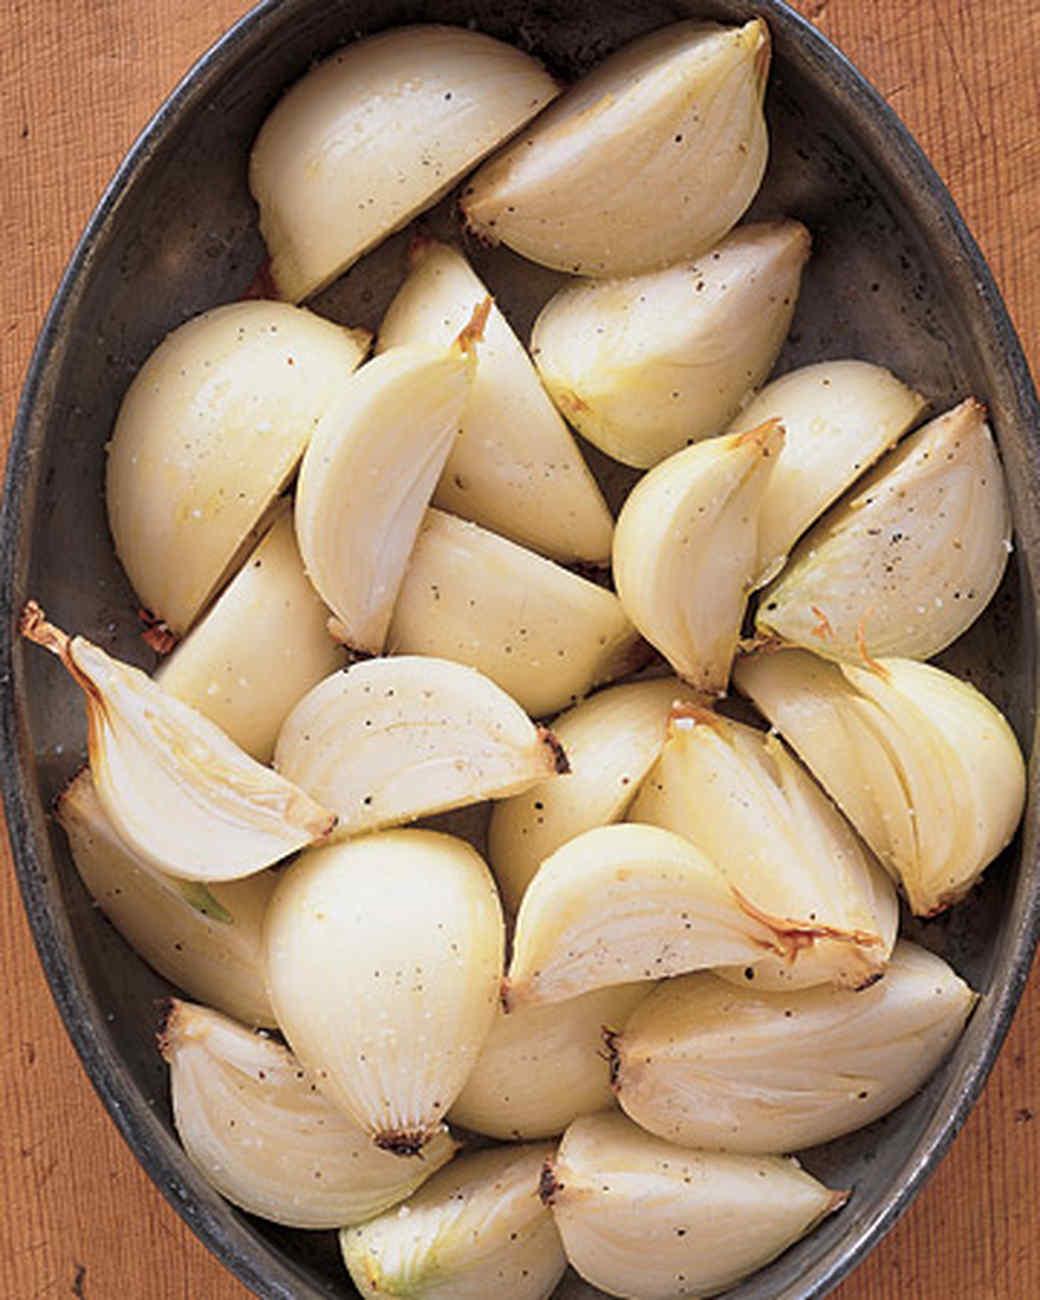 msl210_1002_onions.jpg